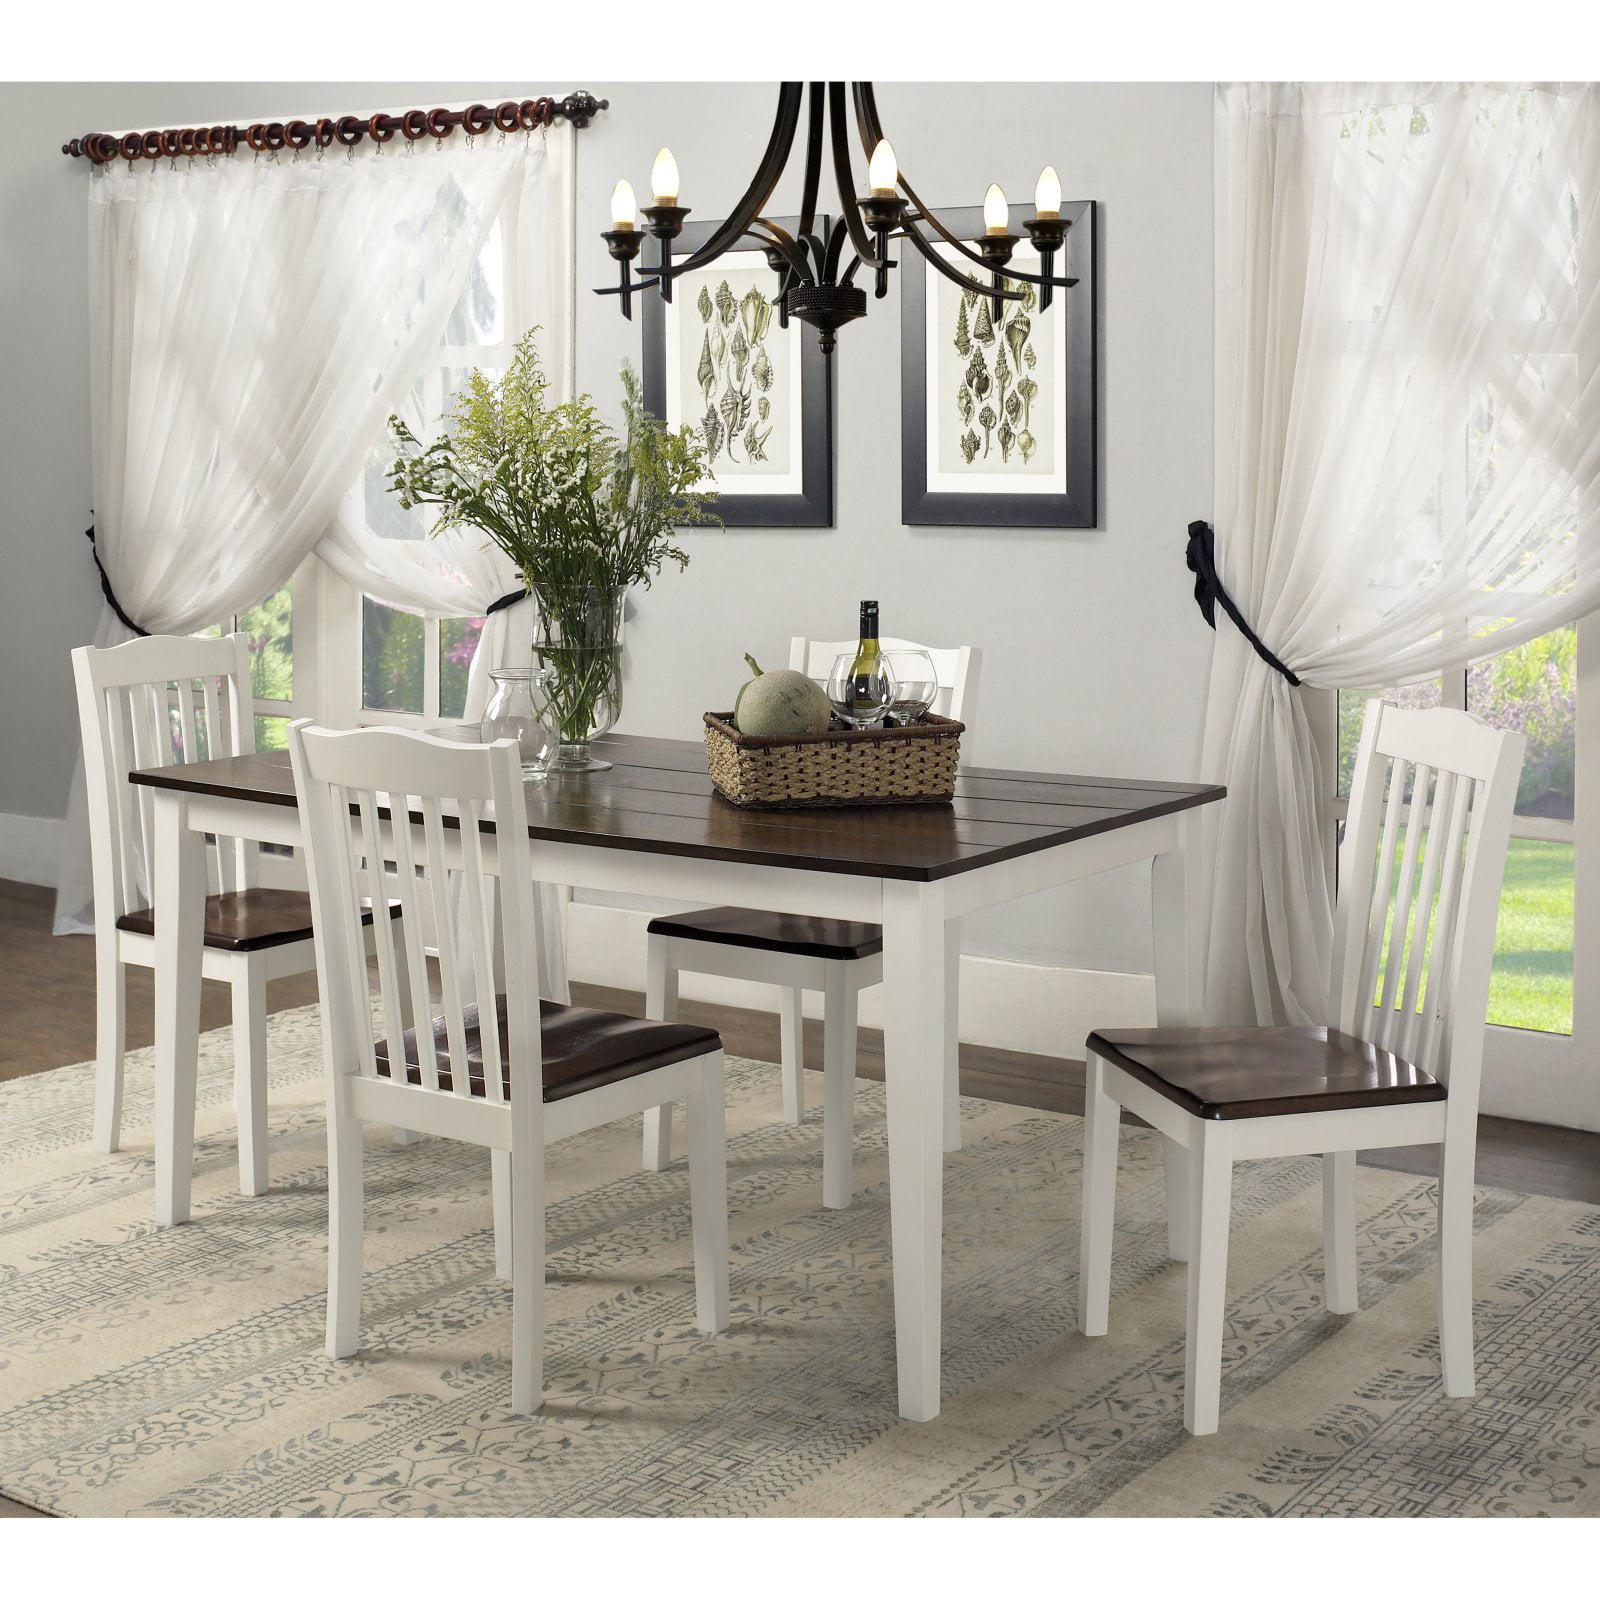 Dorel Living Shiloh 5-Piece Rustic Dining Room Set by Dorel Asia